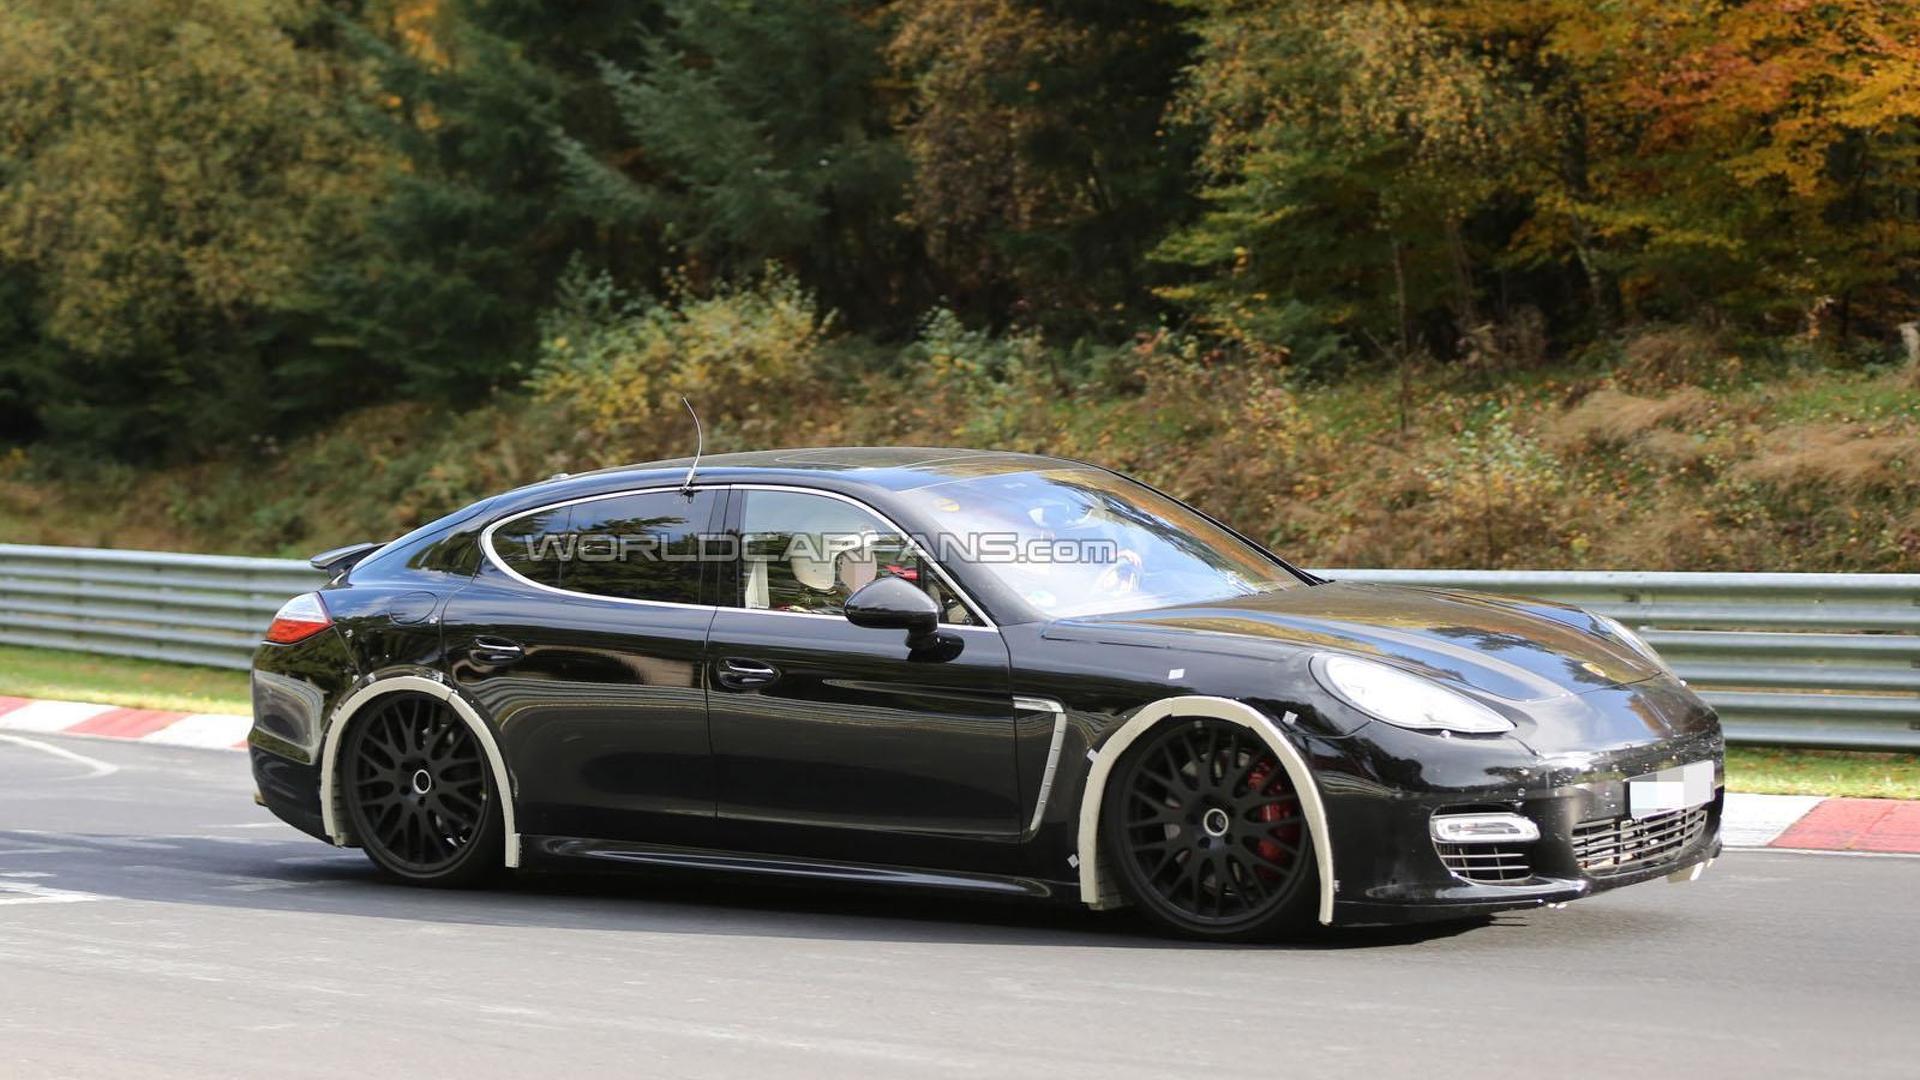 Audi & Porsche feuding over platforms - report